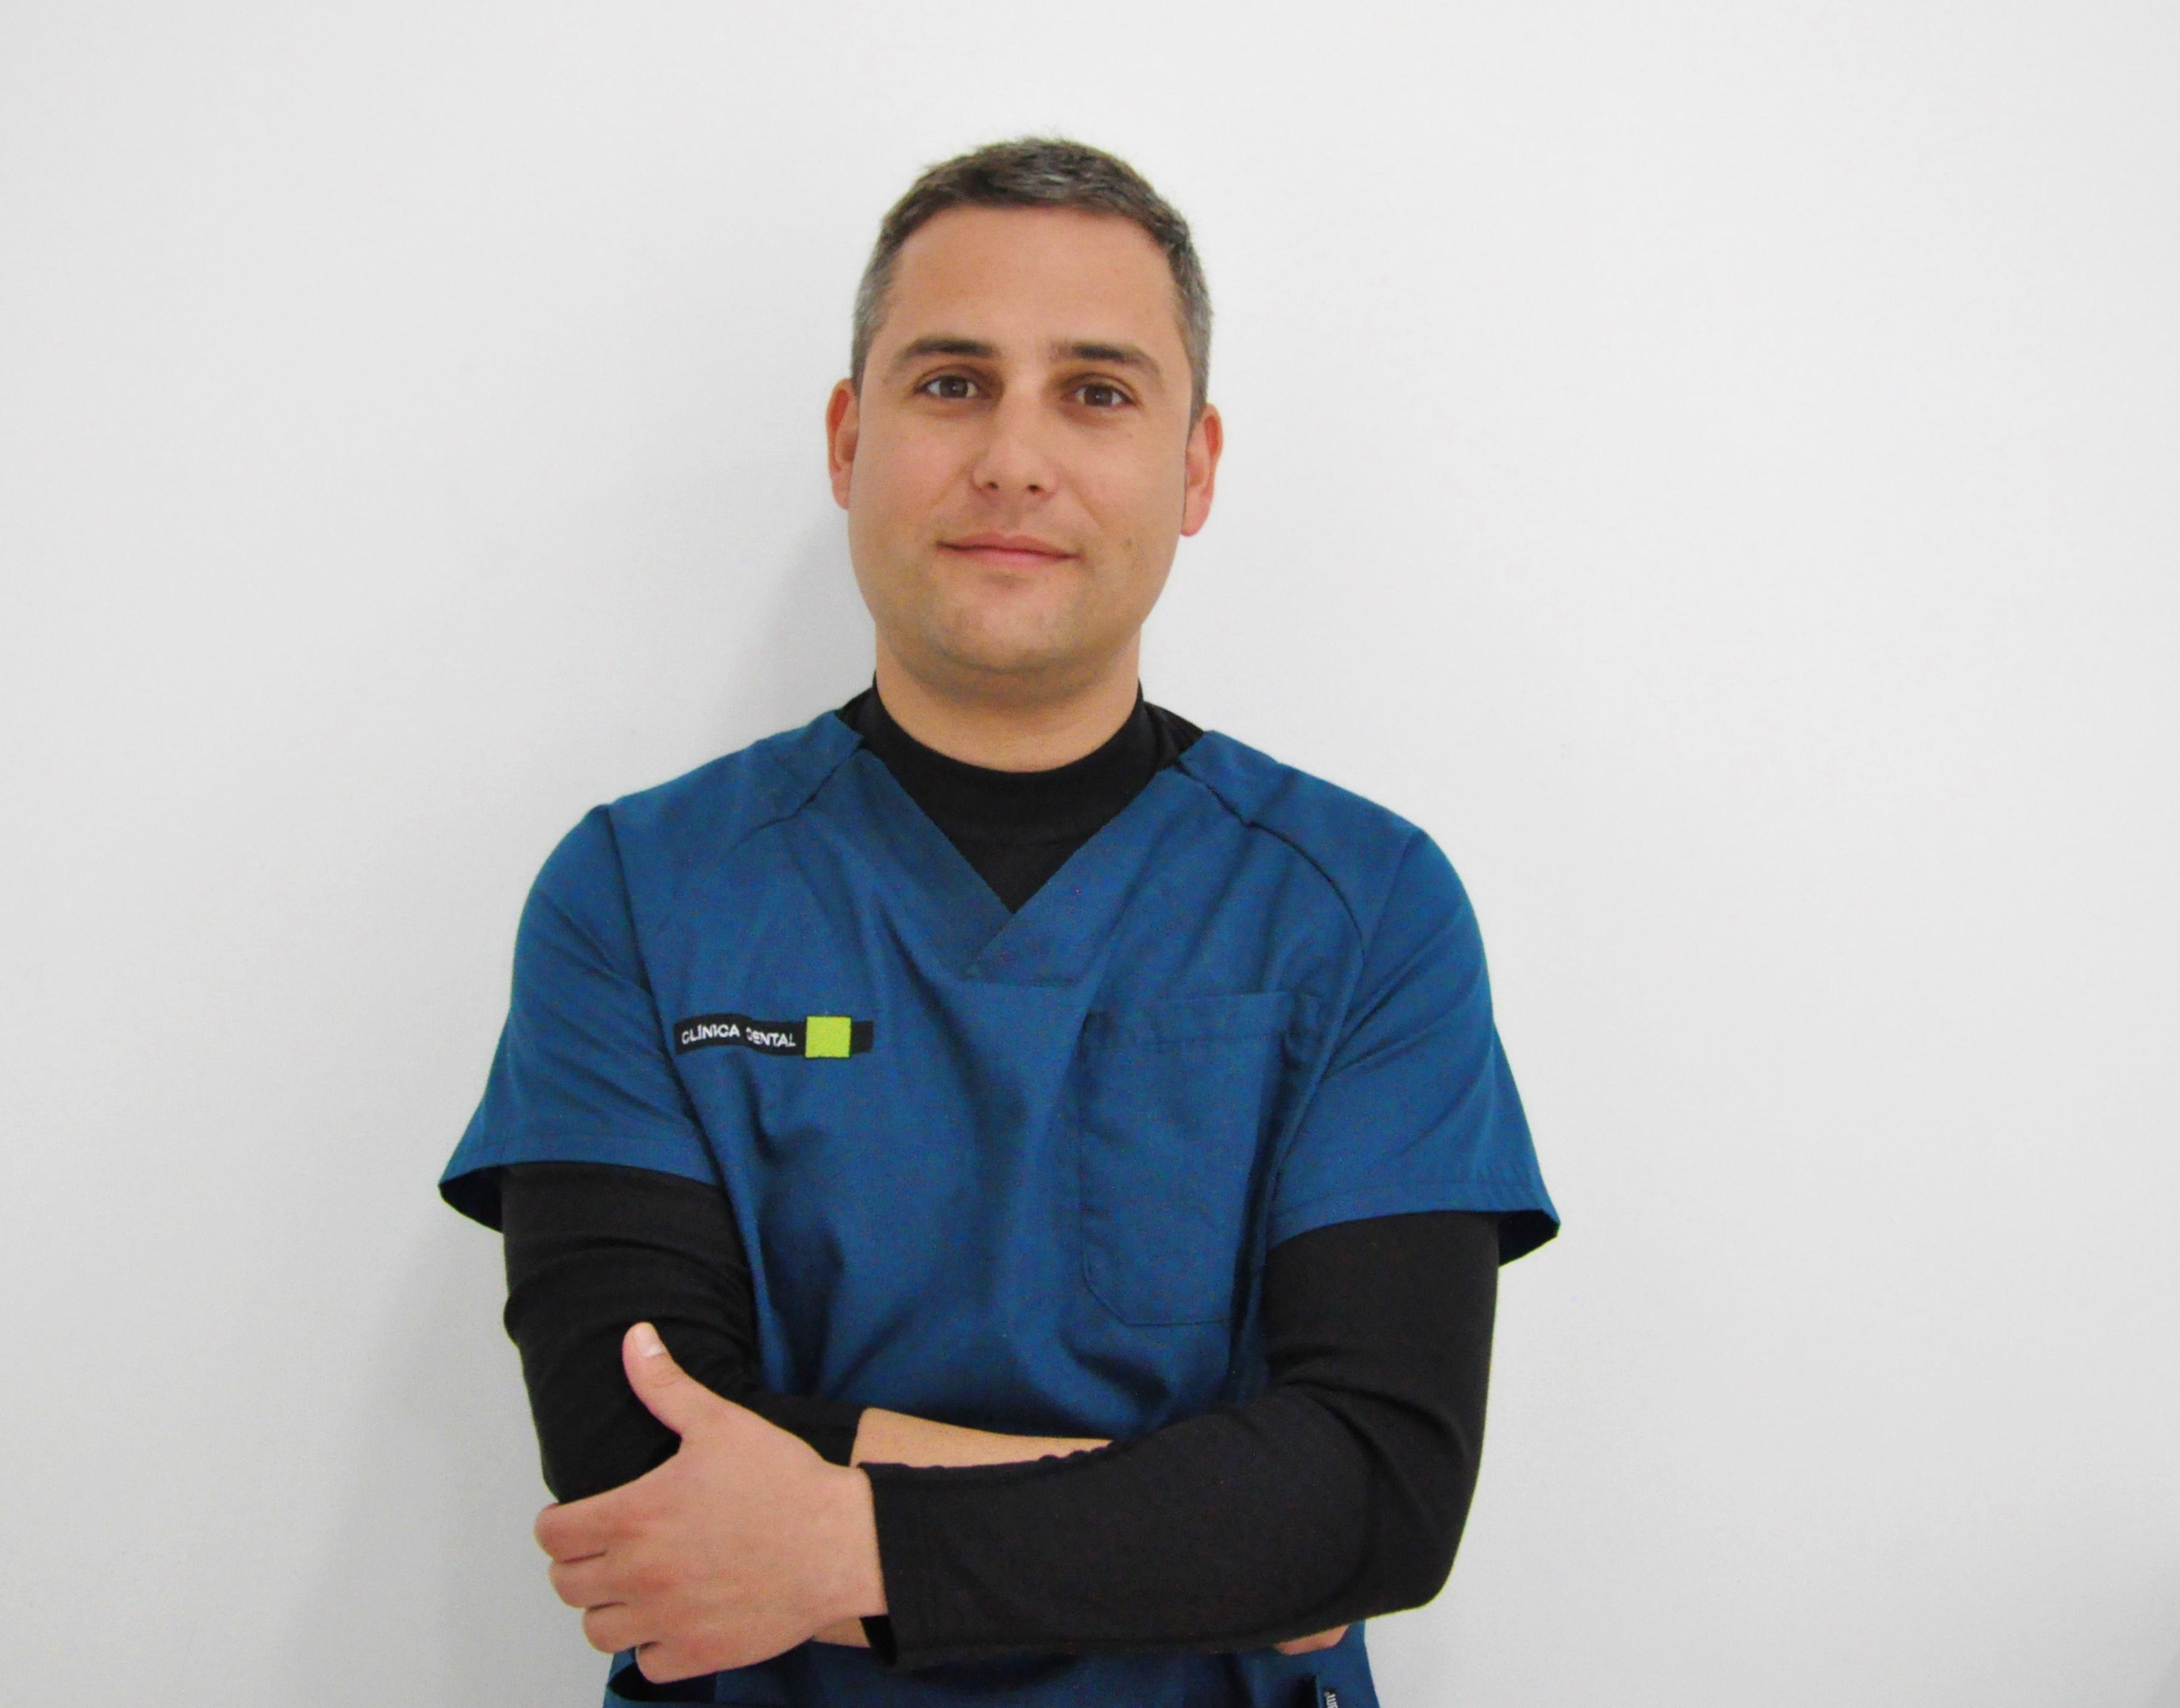 Dr. José Ramón Sánchez